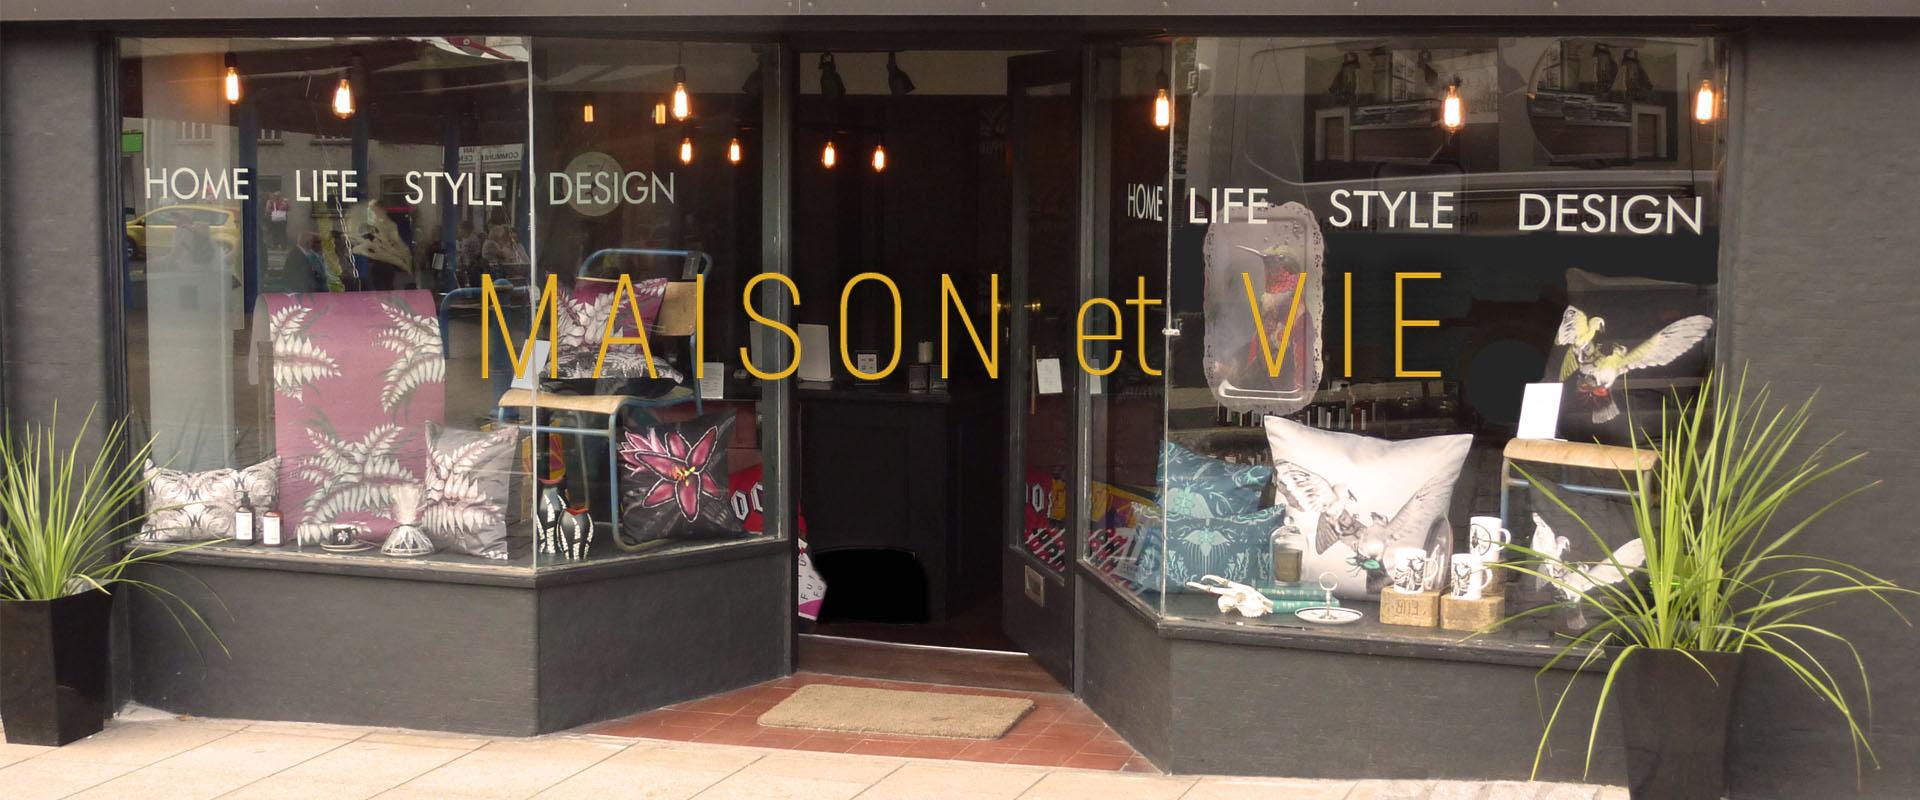 Maison Et Vie Is A Design And Lifestyle Store